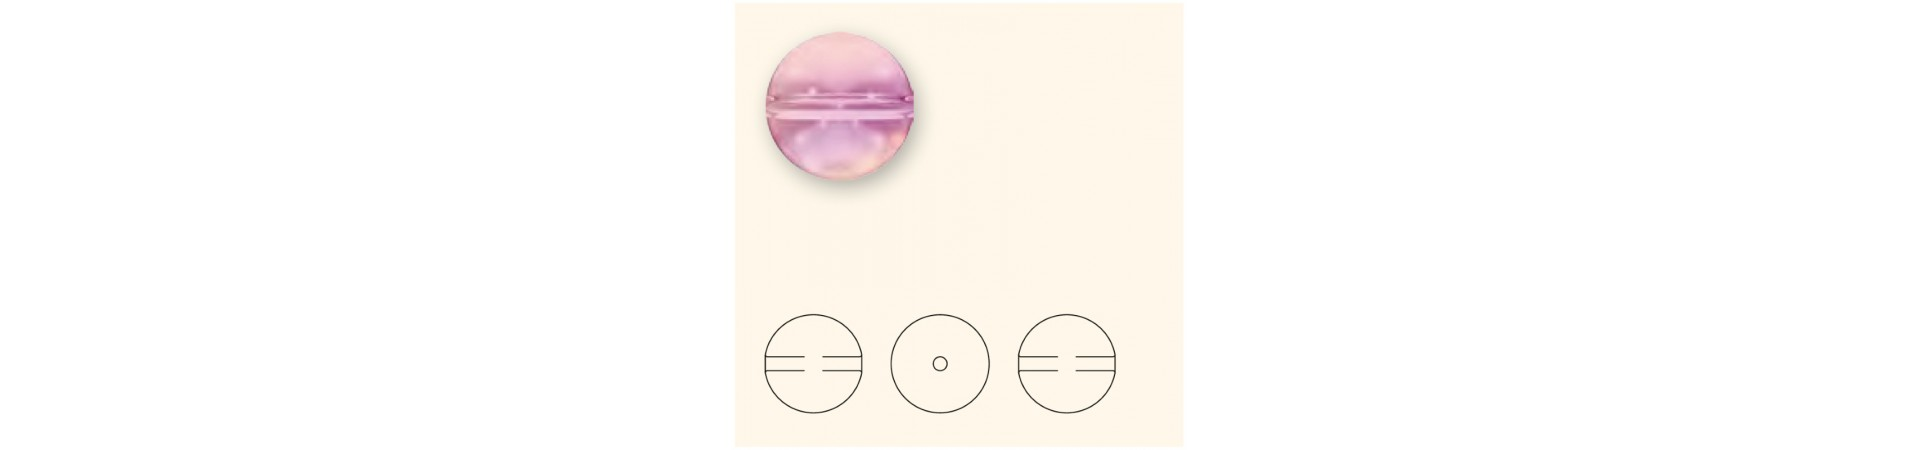 5028/4 Crystal Globe бусинки